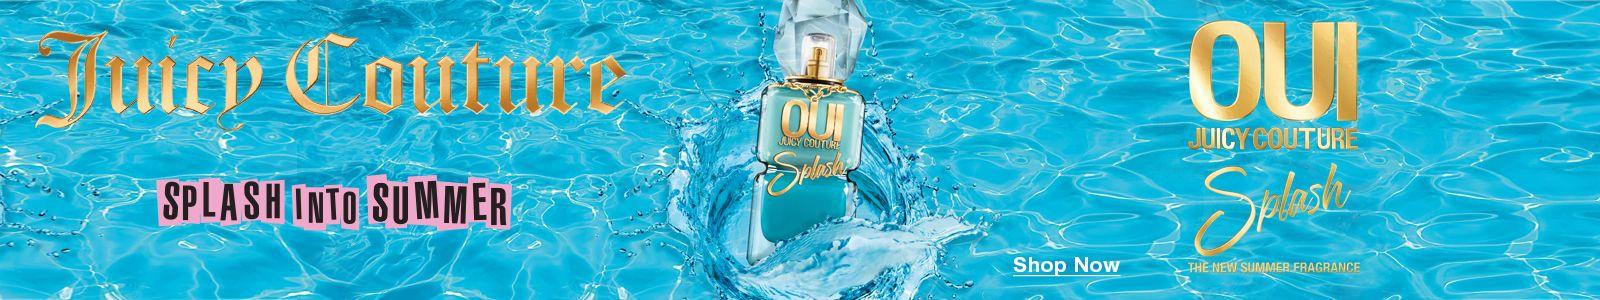 Juicy Couture, Splash Into Summer, Shop Now, OUI Juicy Couture, Splash, The New Summer Fragrance